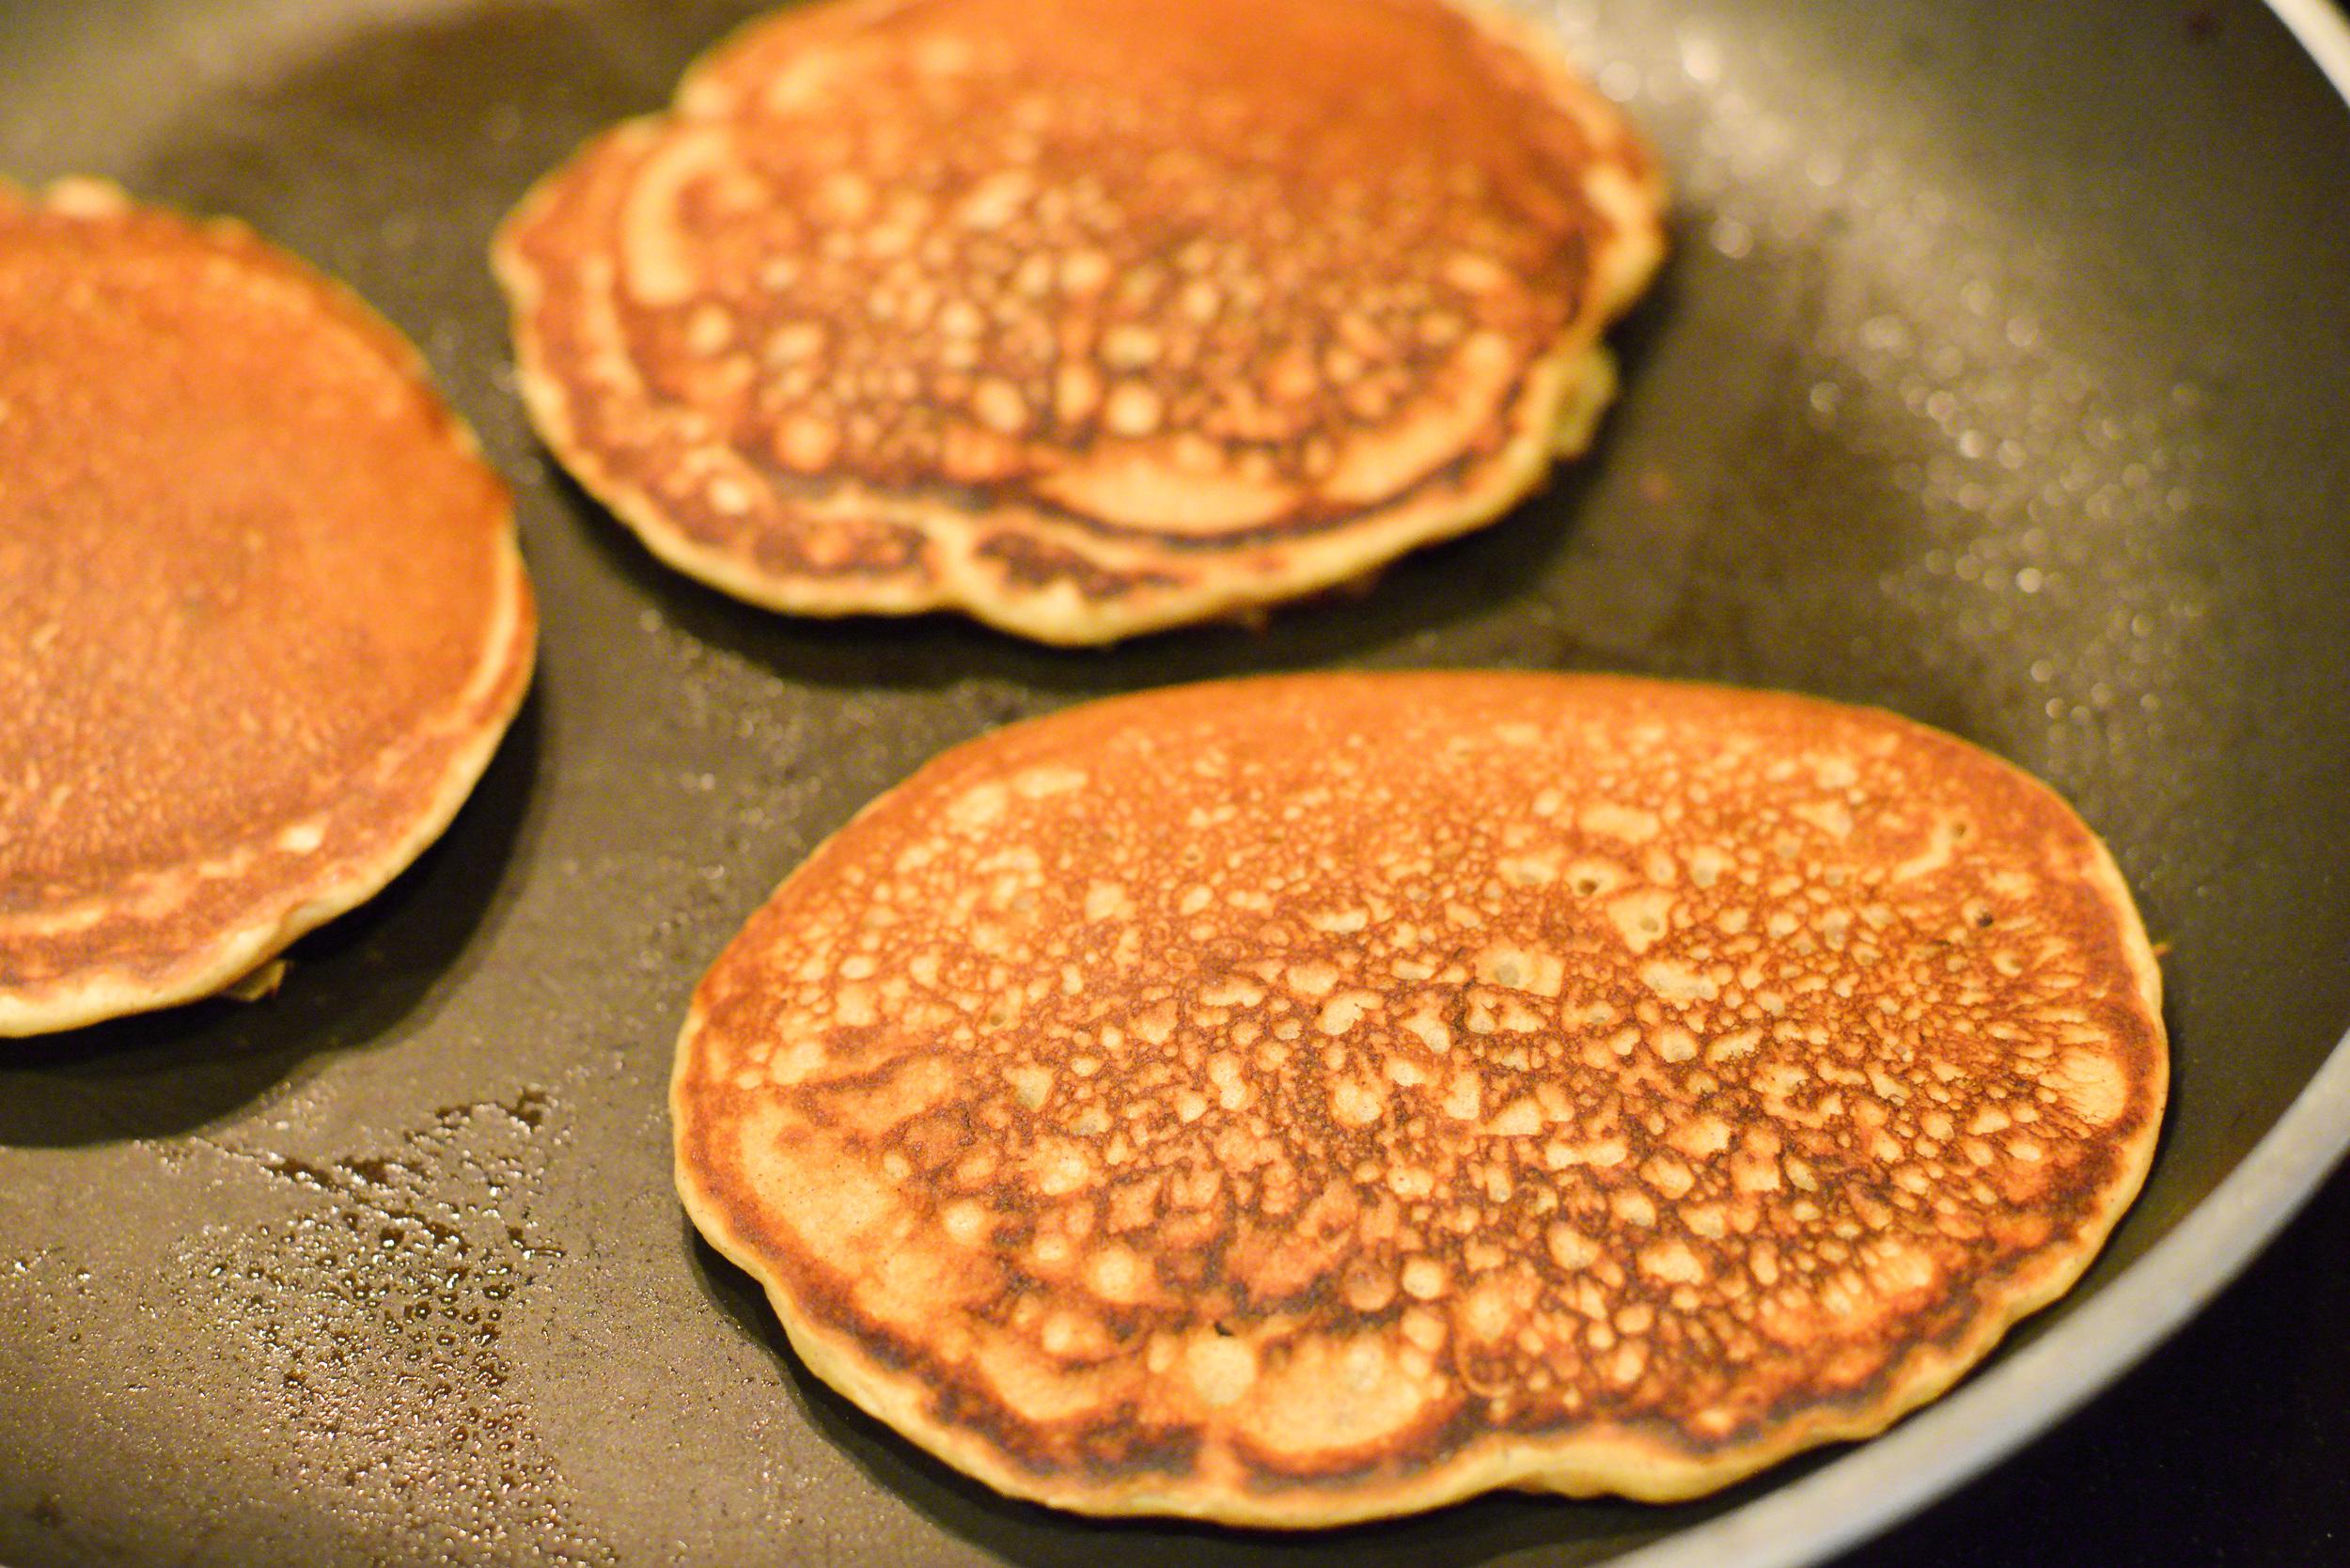 My beautiful pancakes!